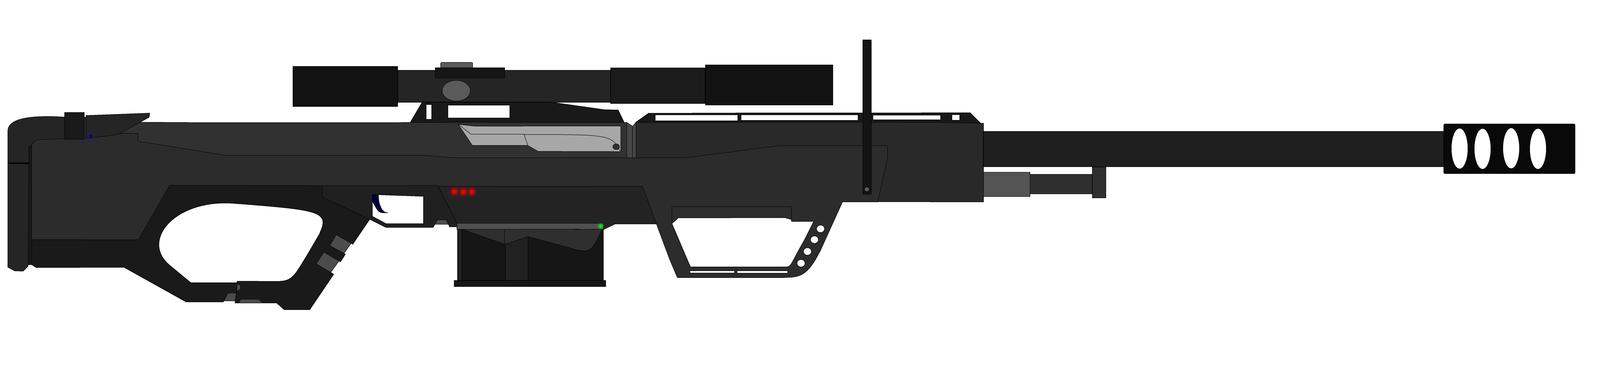 Drawn shotgun sniper rifle Cal Rifle 50 Aspire443 Sniper